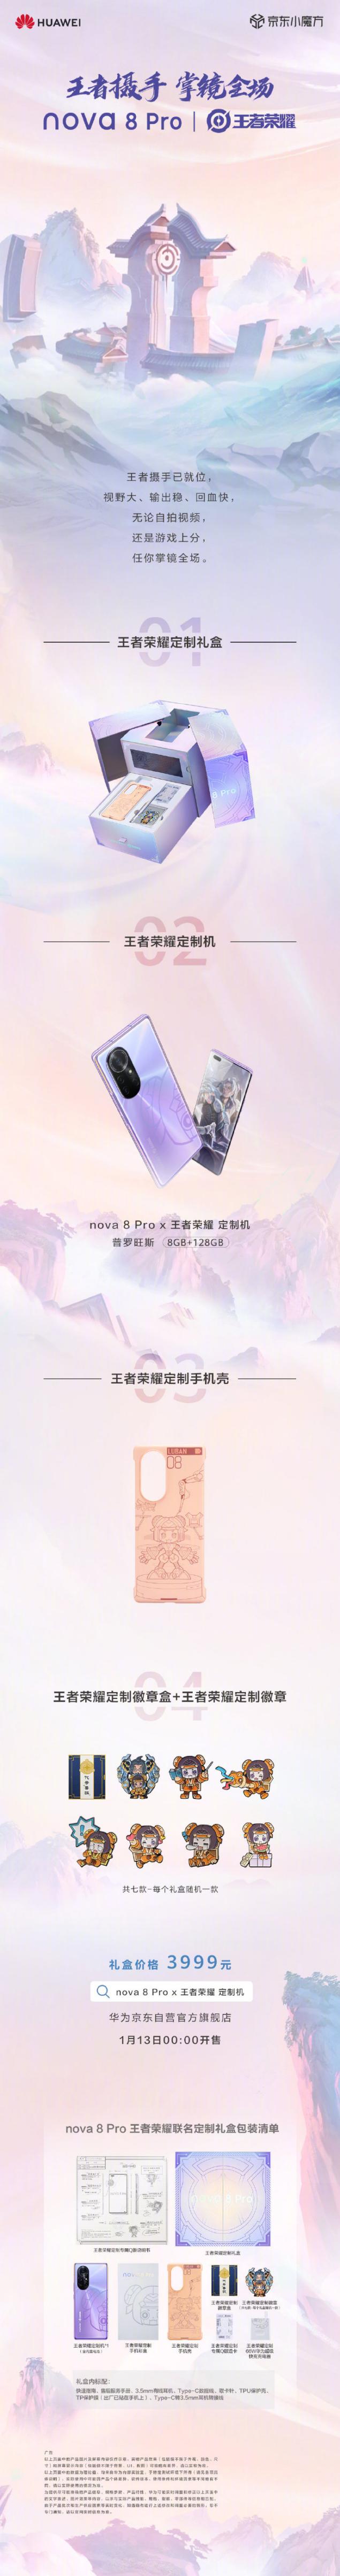 huawei nova 8 pro king of glory annuncio